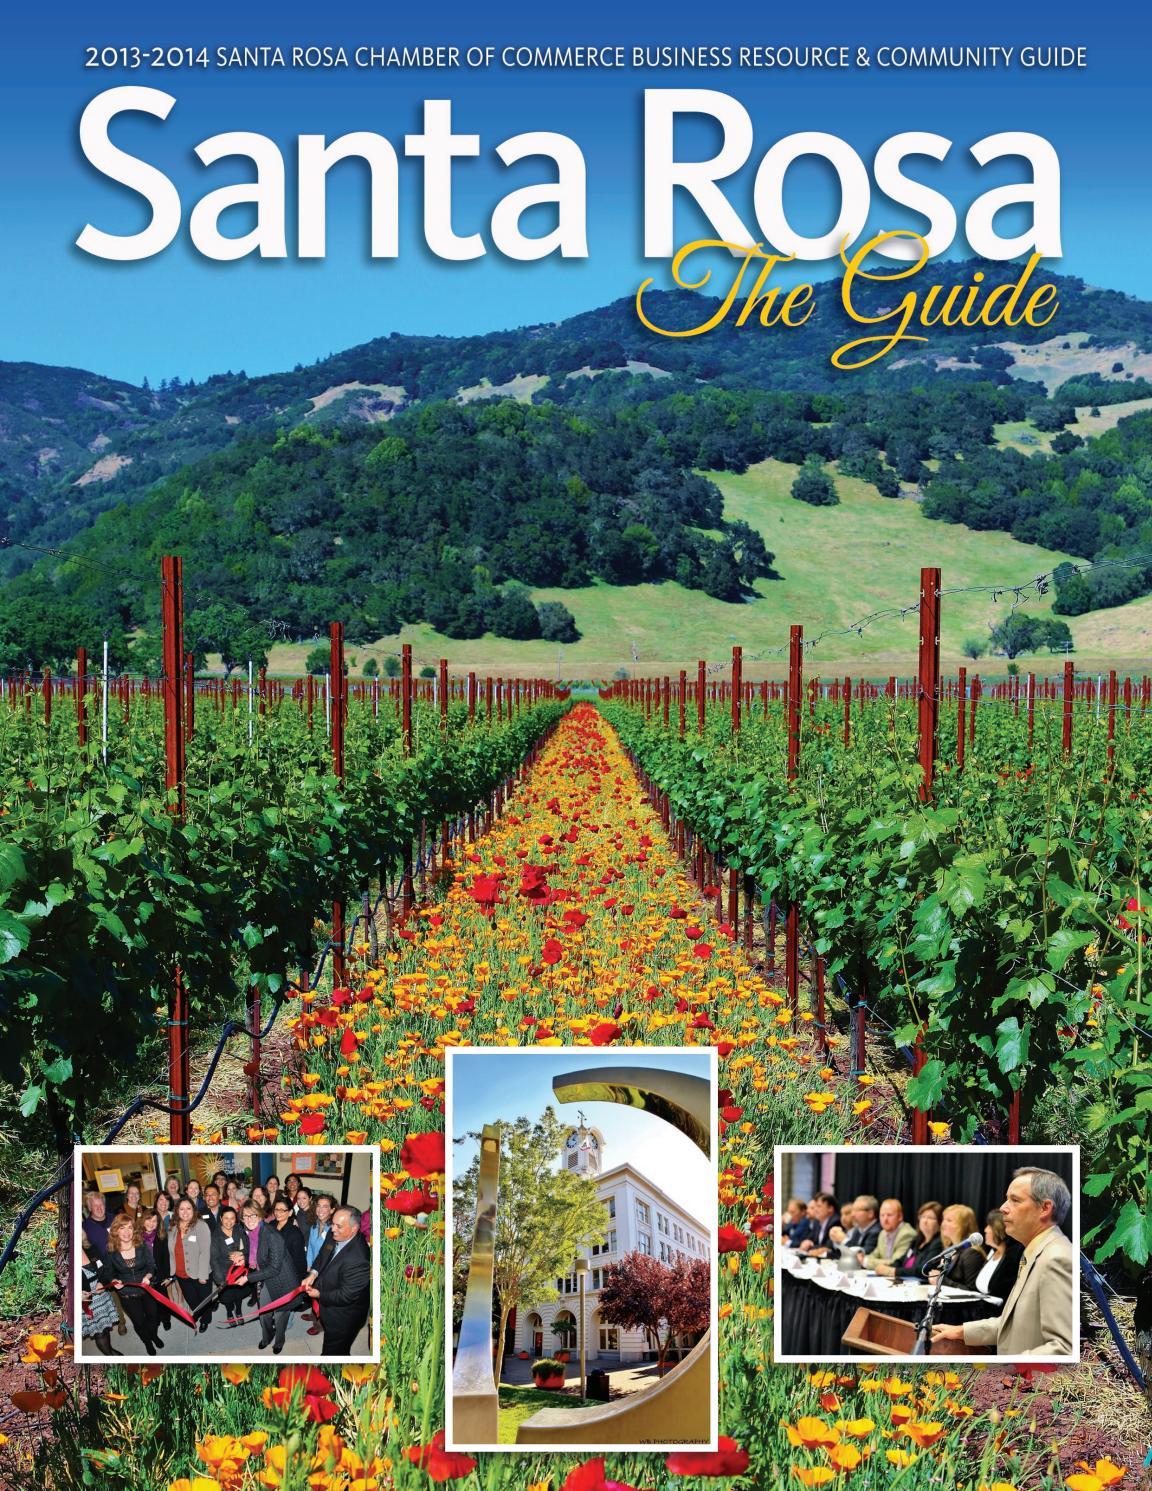 2014 Santa Rosa Chamber Community Resource & Business Guide